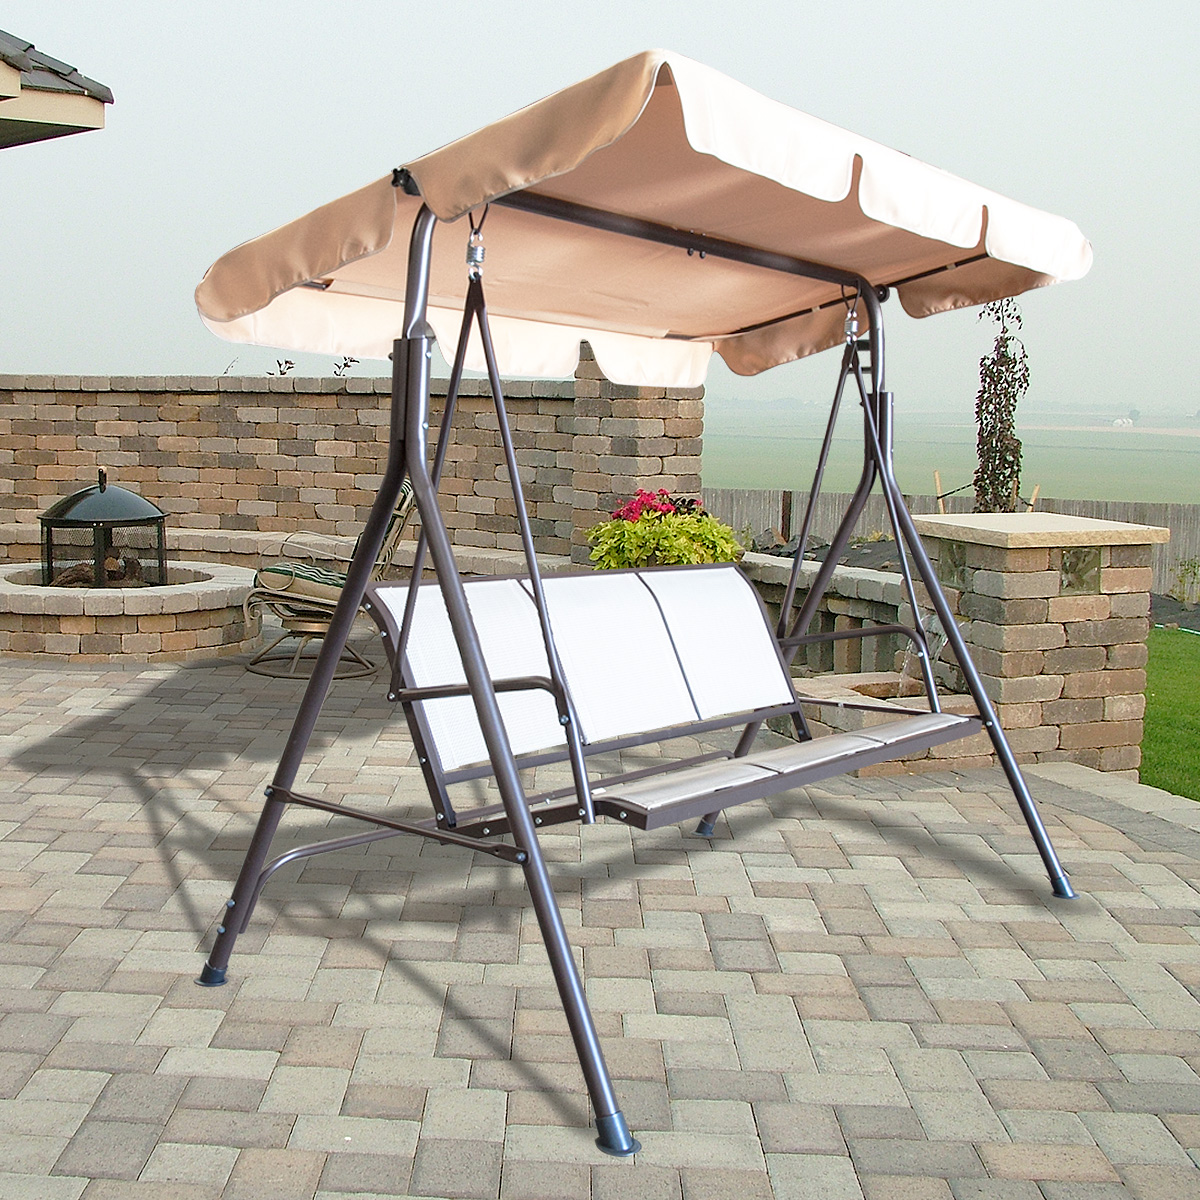 3 Person Canopy Swing Glider Hammock Patio Furniture